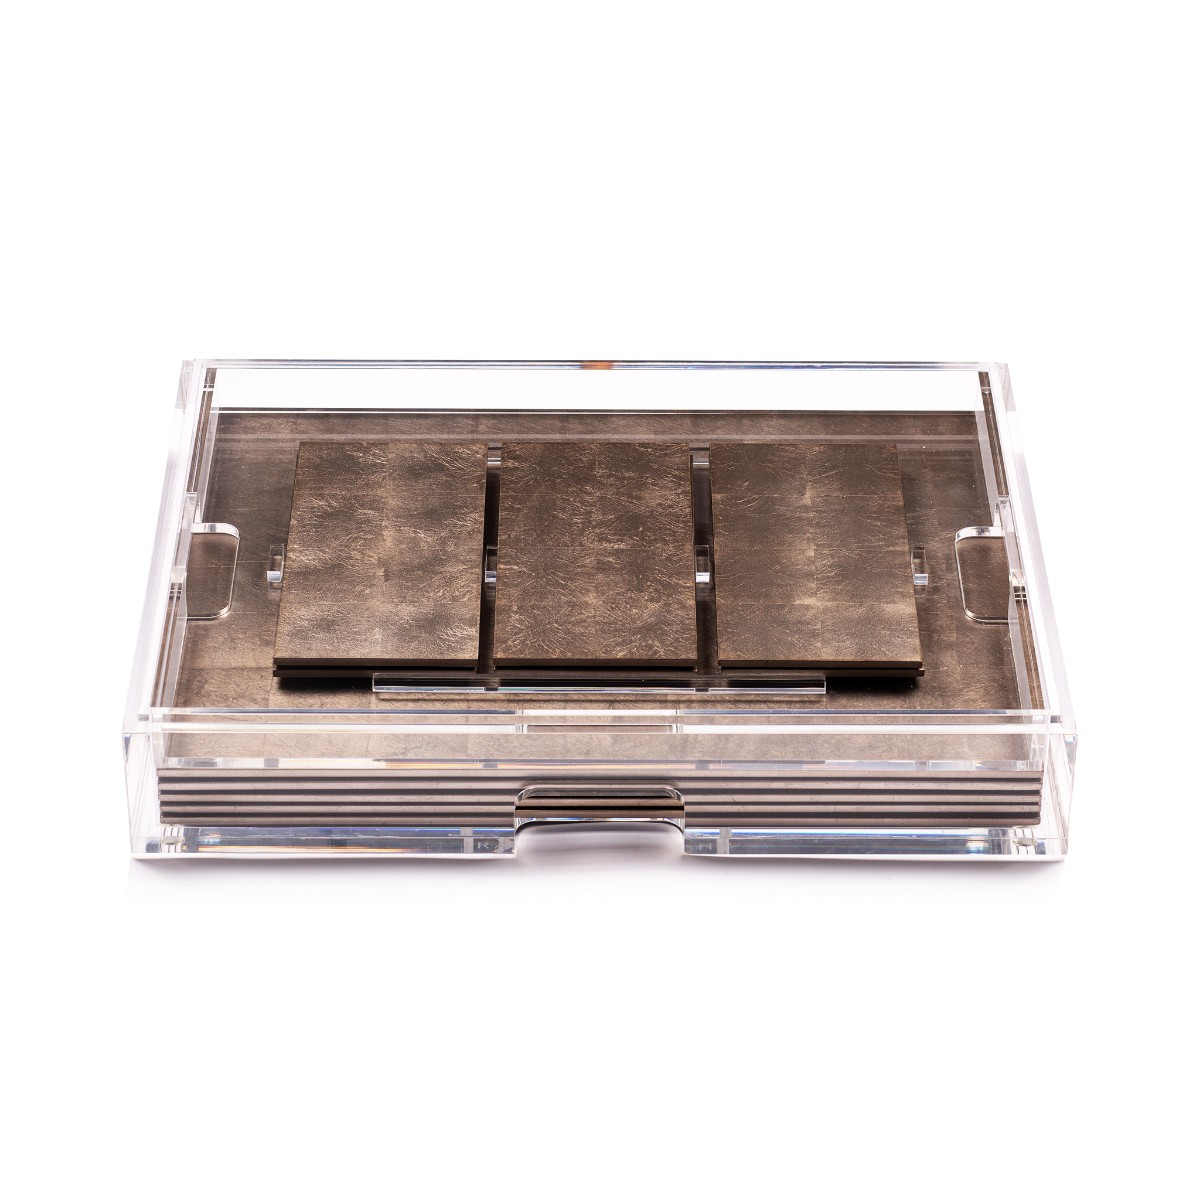 Posh Trading I Clear Grand Matbox I Silver Leaf Taupe